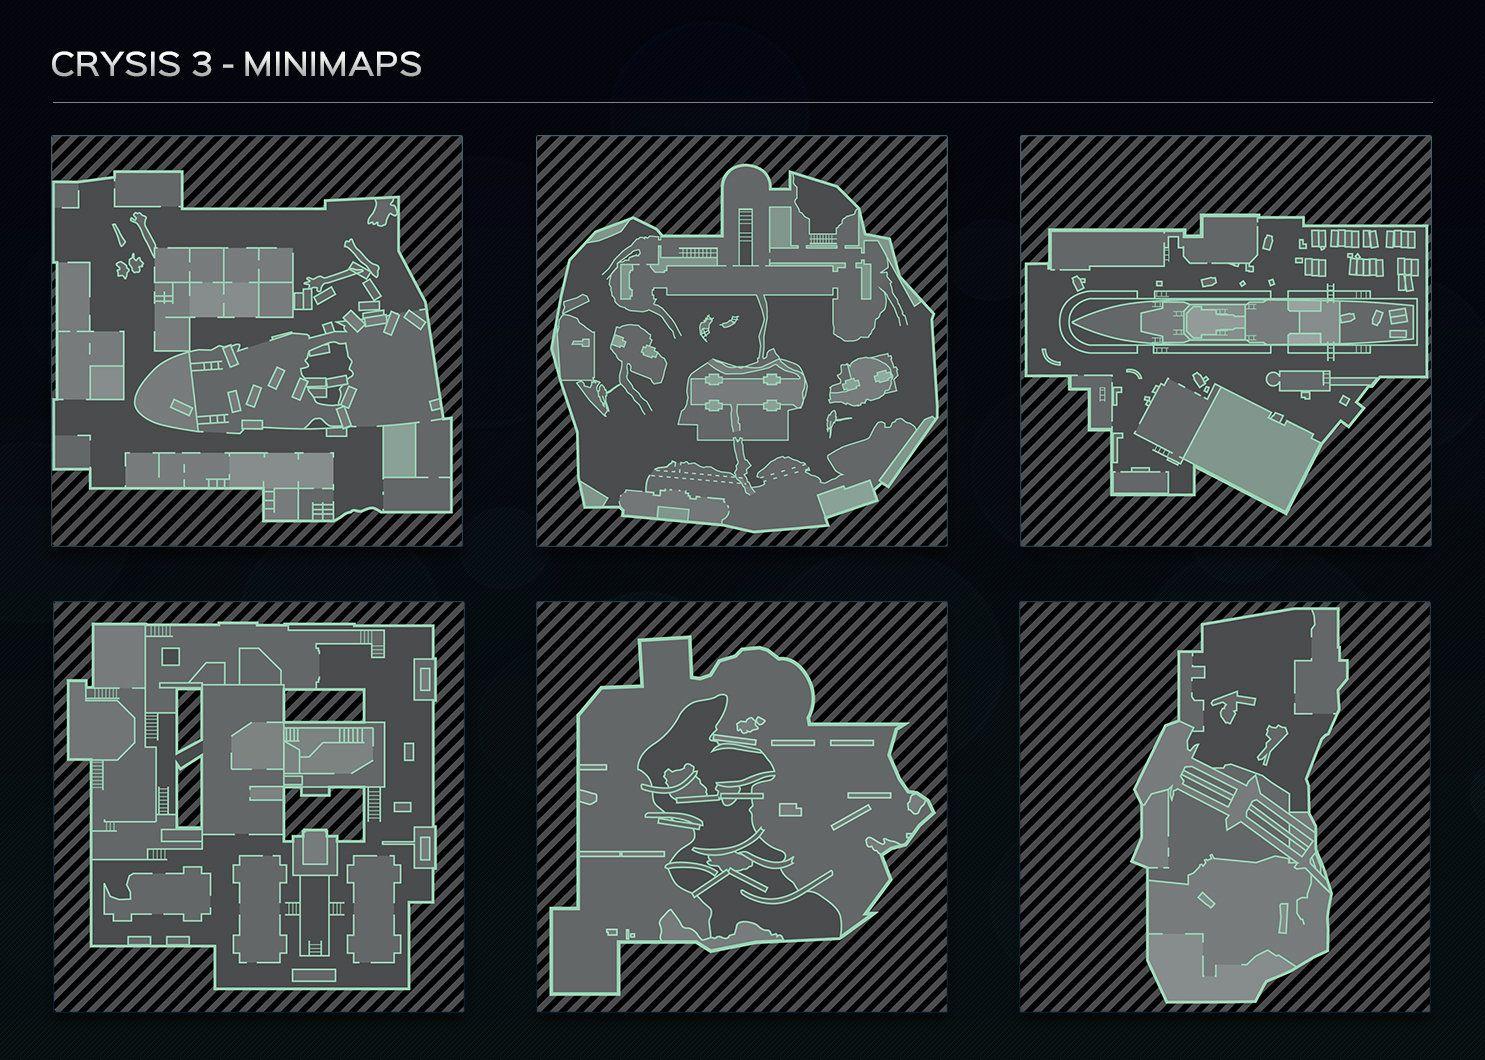 ArtStation Crysis 3 Minimaps, Gavin Bird Artwork